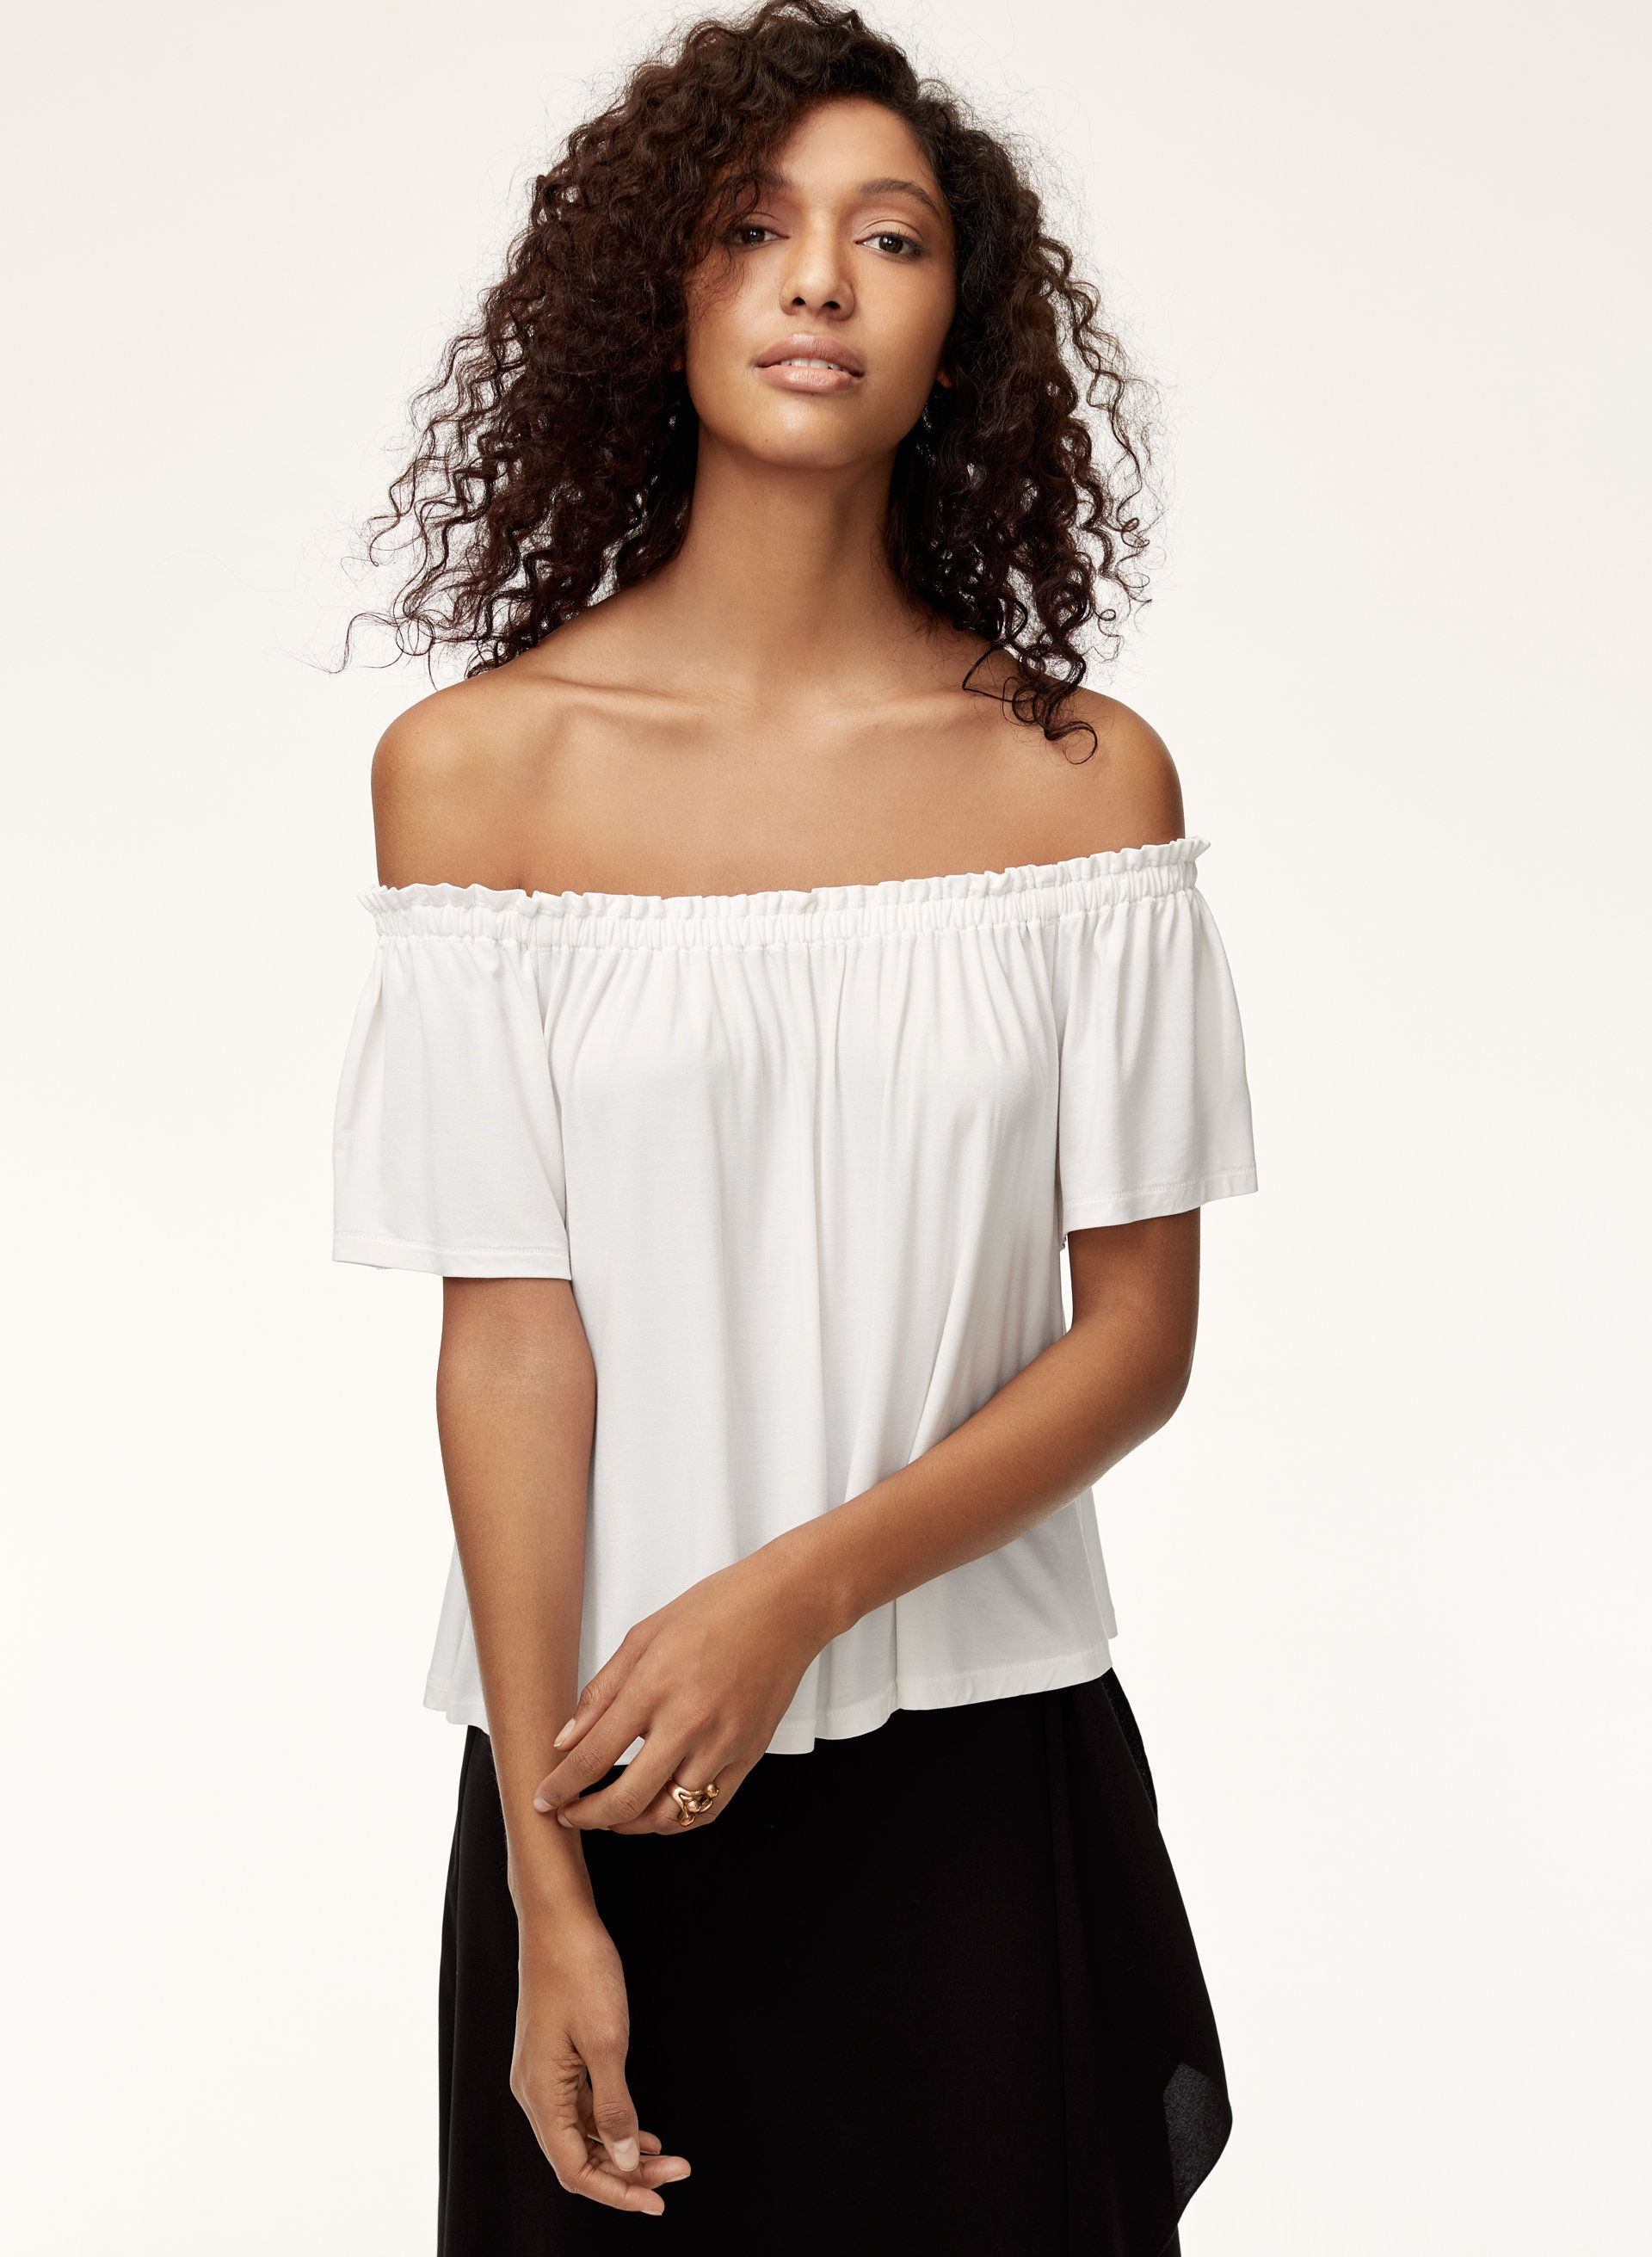 64fff992395fea Sartre t-shirt | ss18 | Shirts, T shirt, Off shoulder blouse